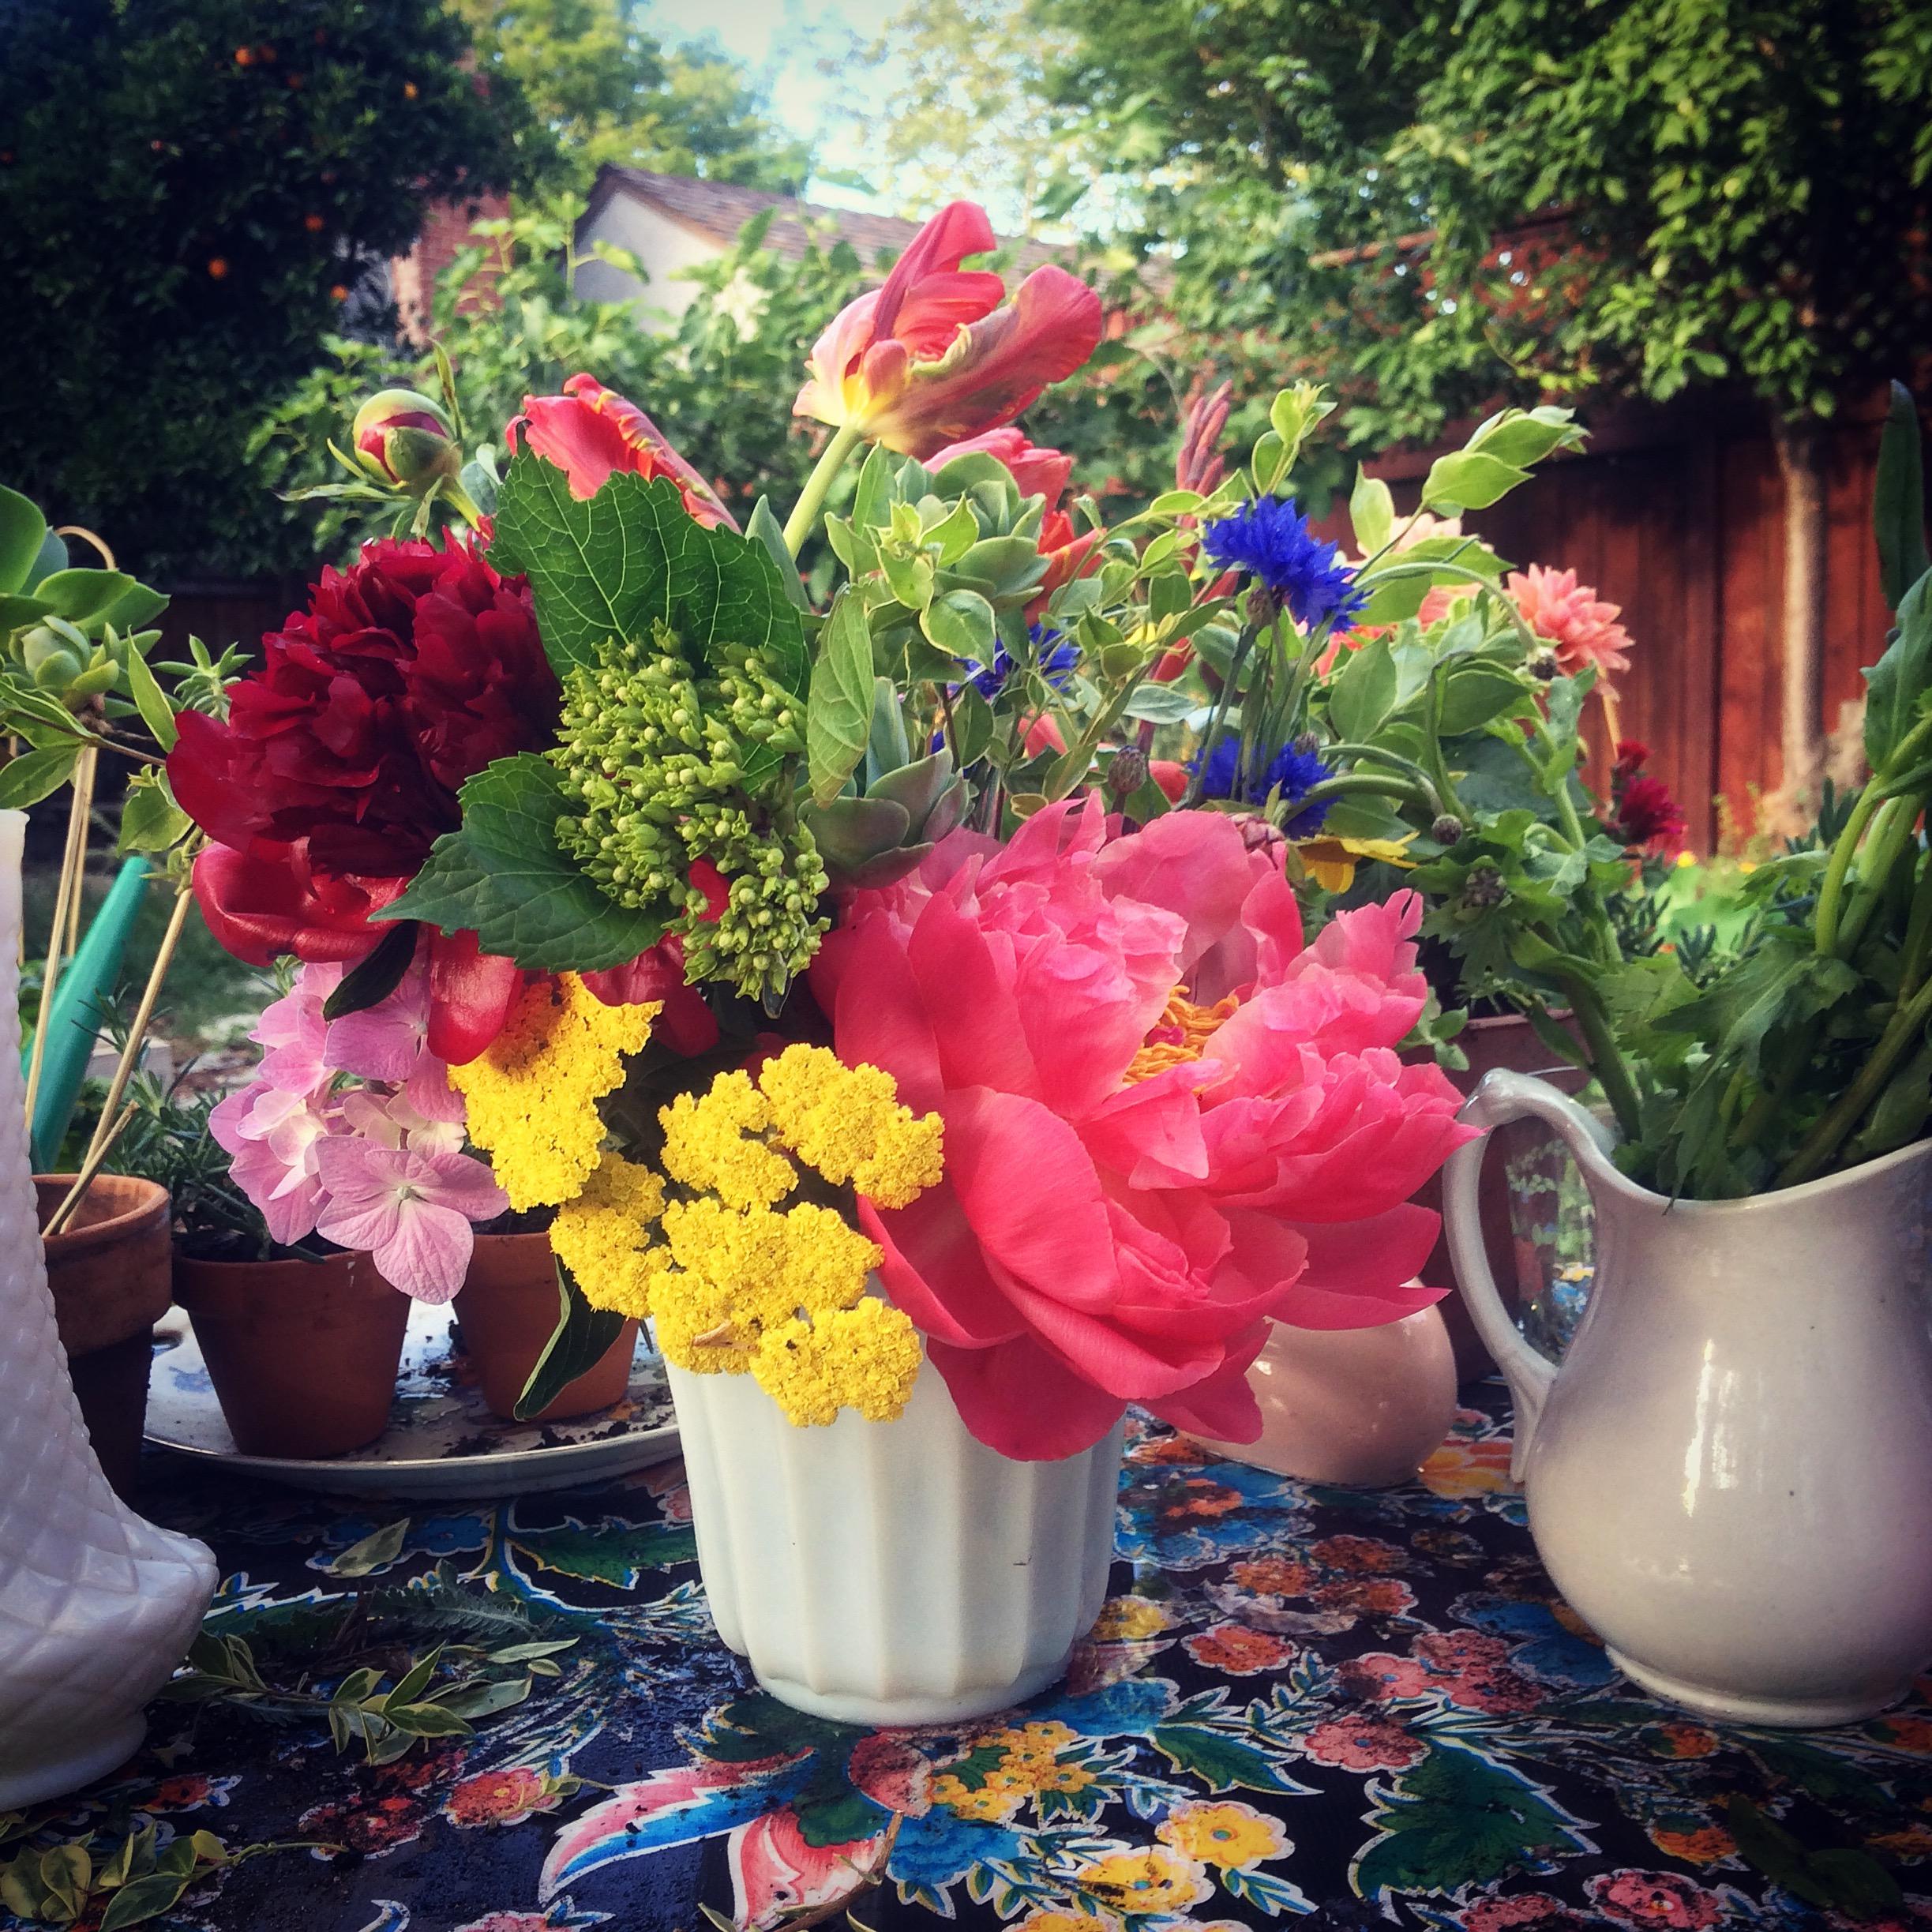 Sampling of the Land Park Tea and Garden Tour centerpiece for tables...